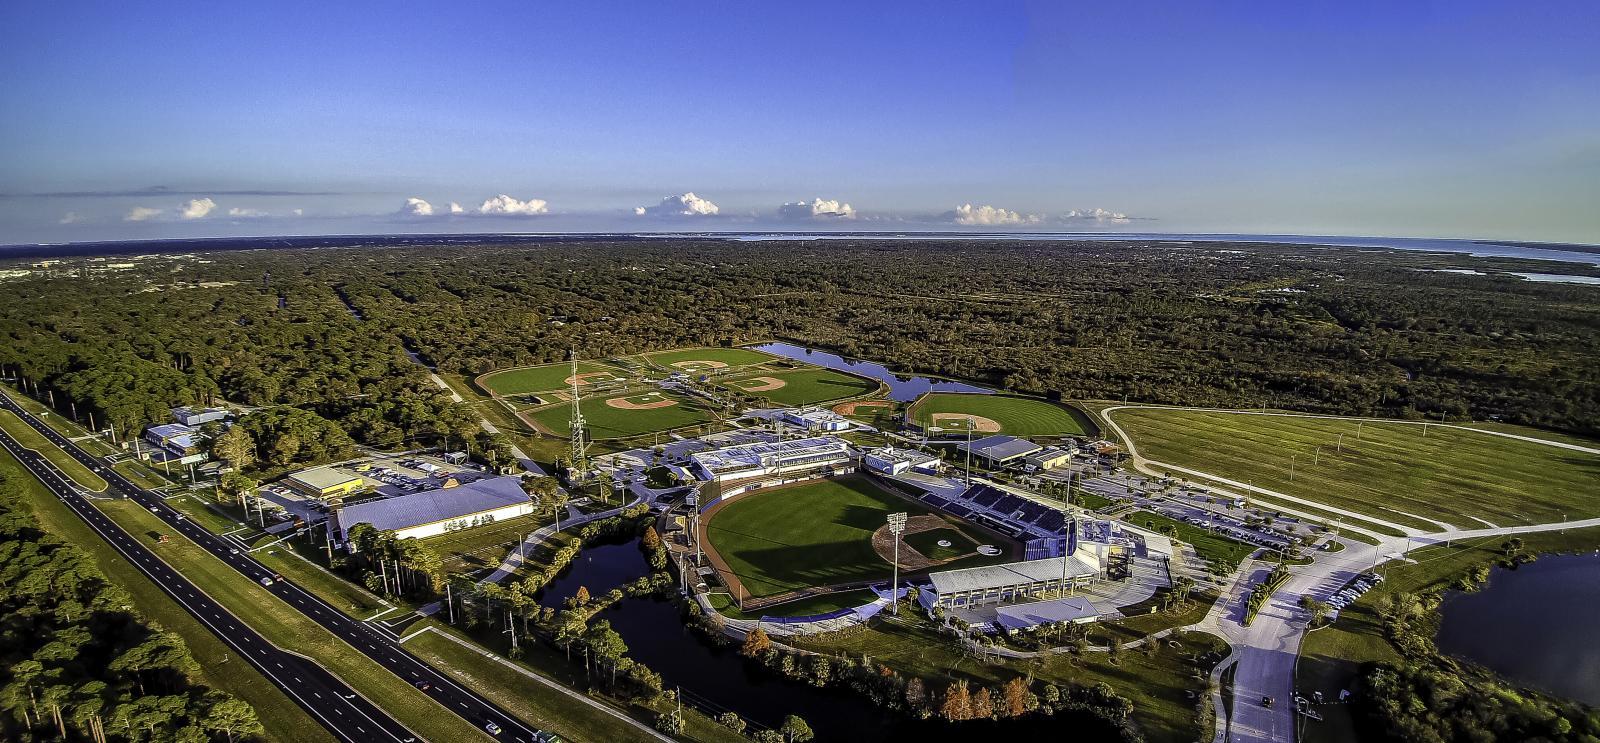 Charlotte Sports Park